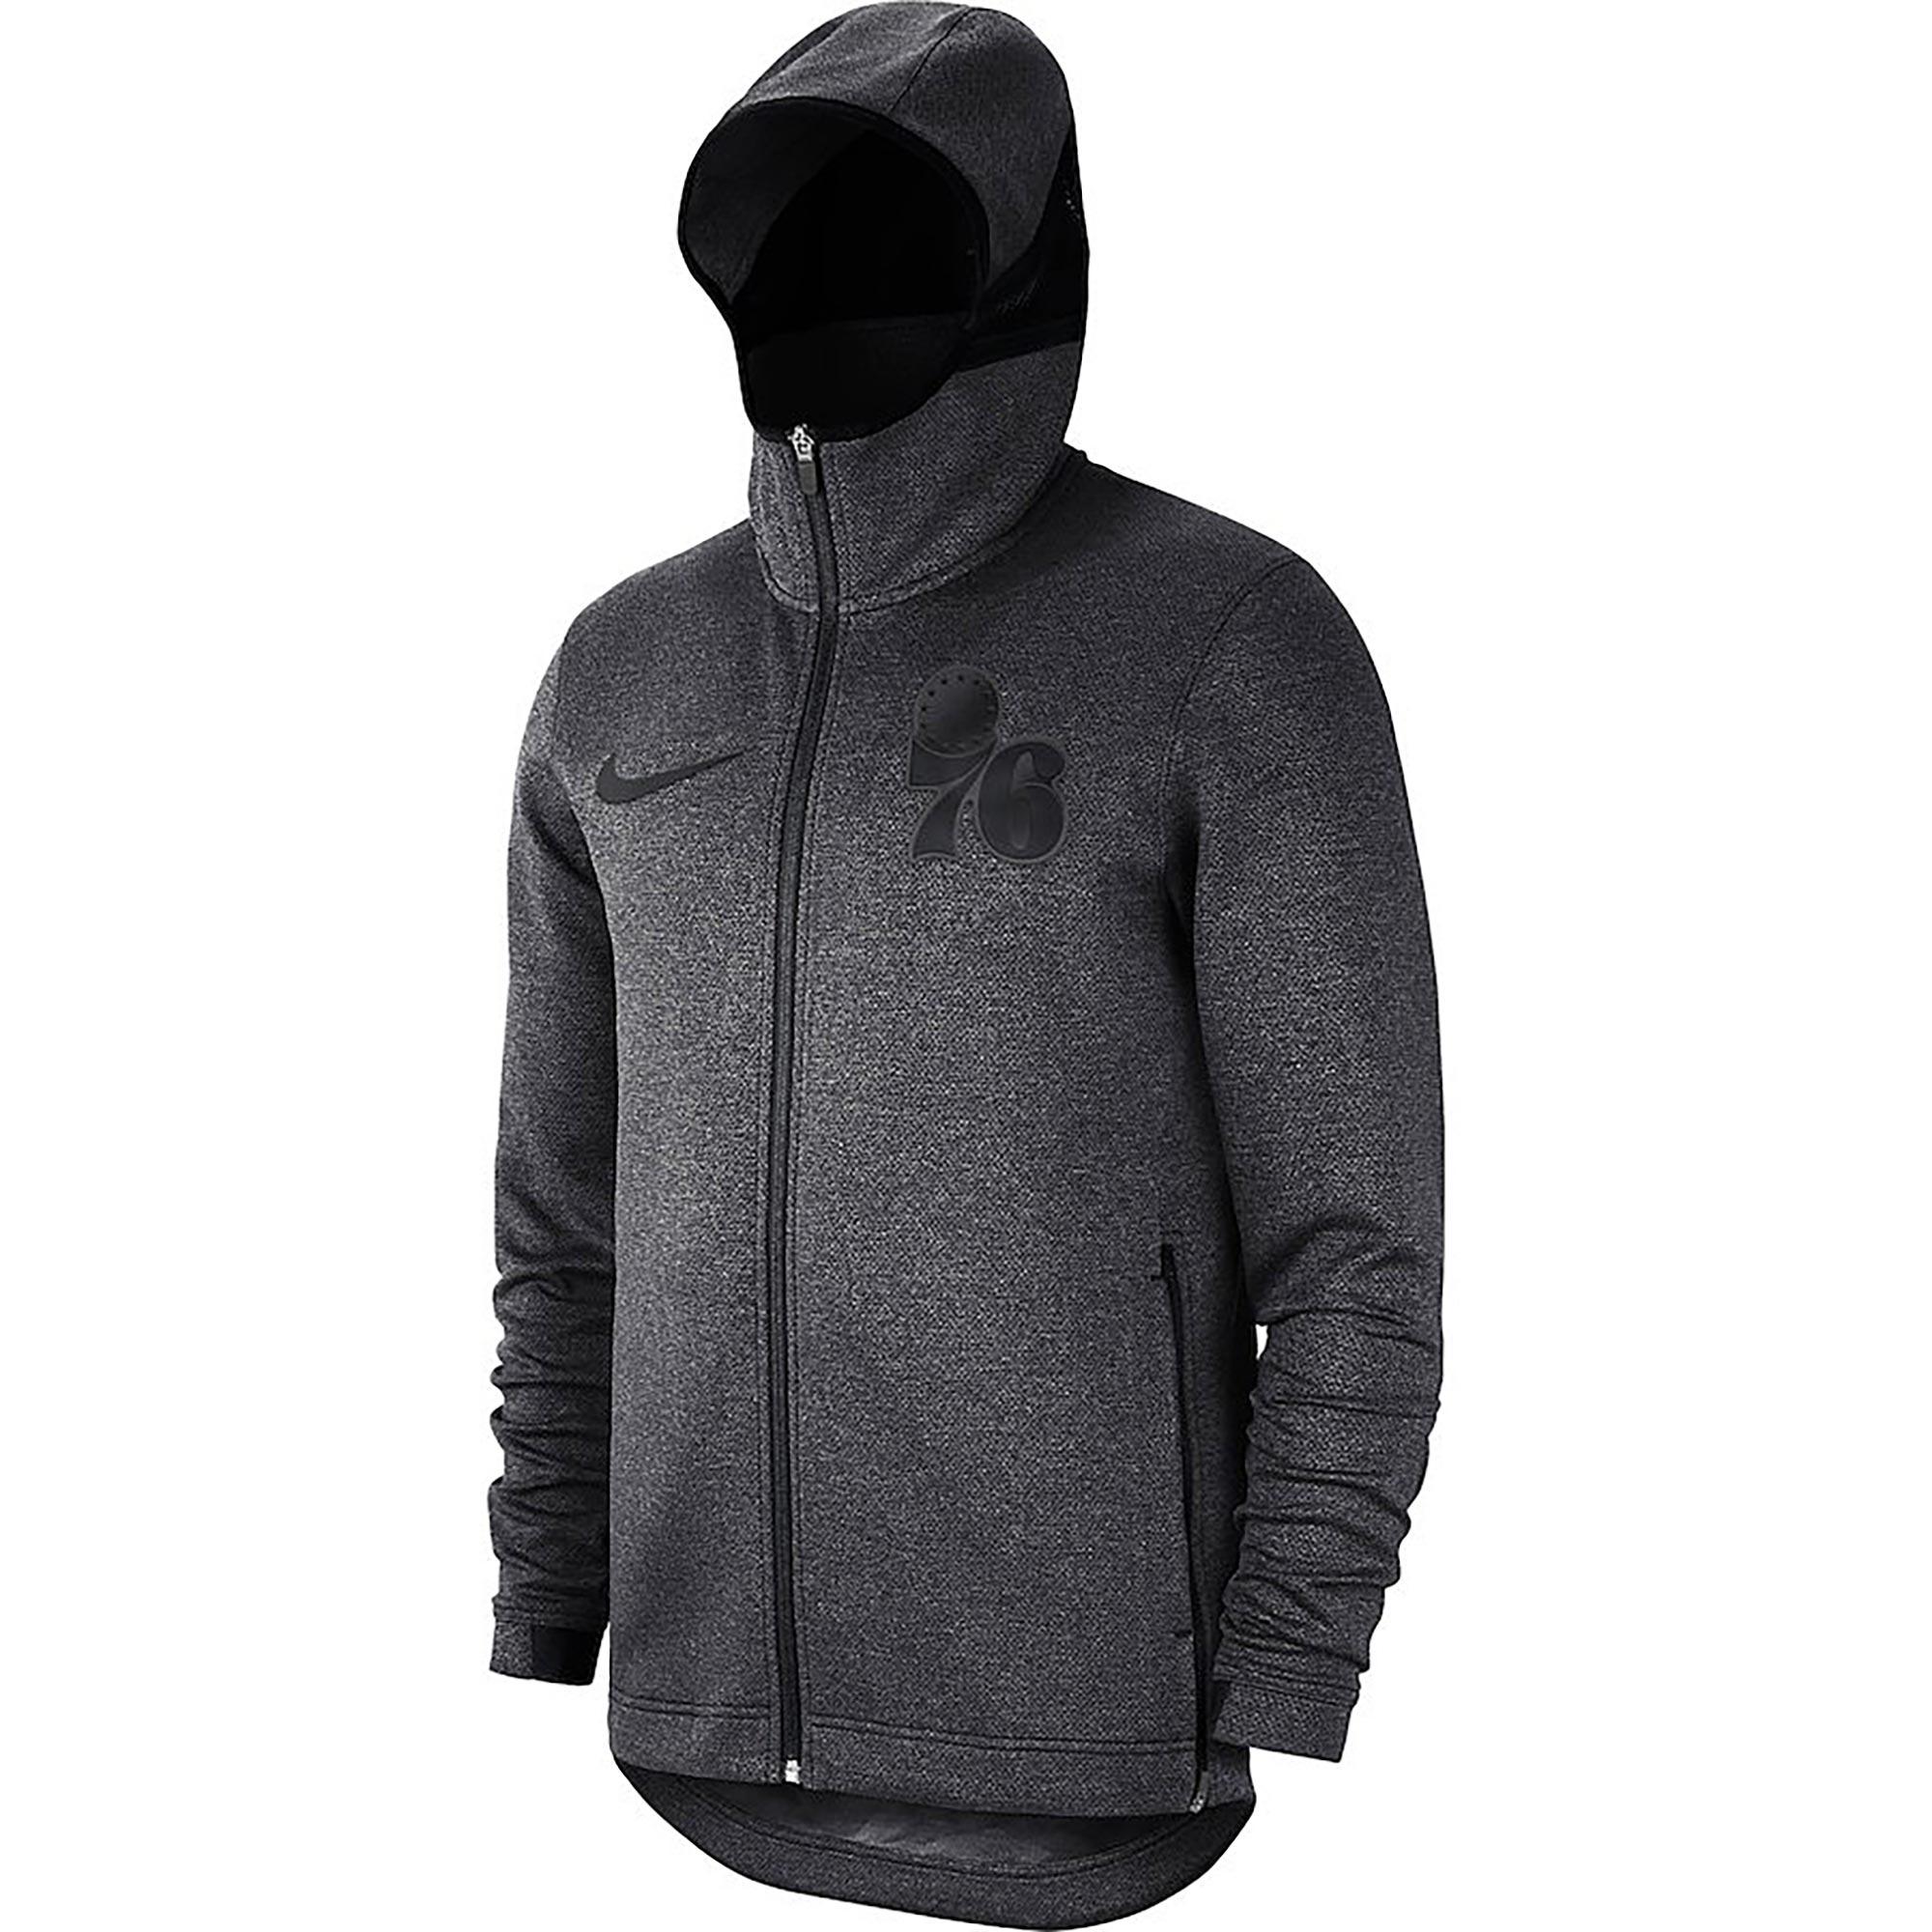 Outerstuff EMEA Ltd / Philadelphia 76ers Nike Showtime Therma Flex Hoodie - Youth